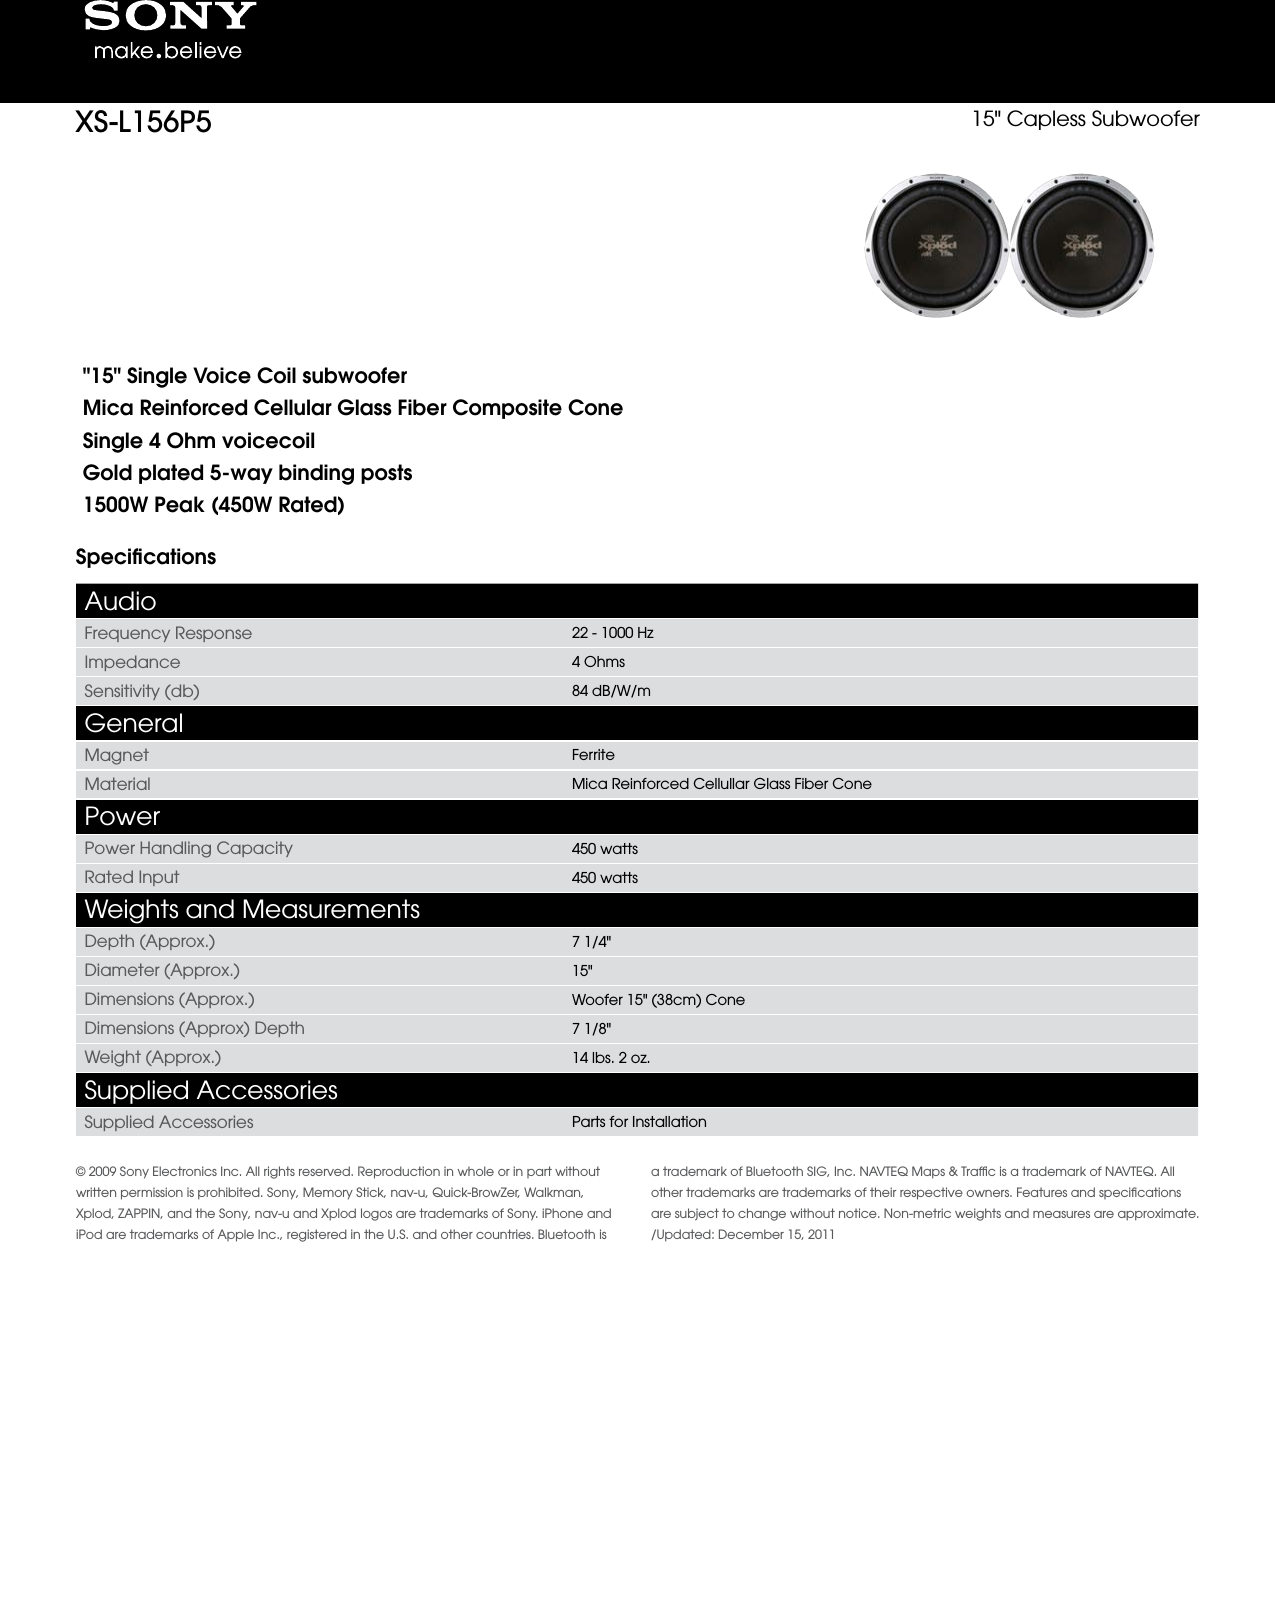 sony xs l156p5 user manual marketing specifications xsl156p5 mksp rh usermanual wiki Navteq GPS Navteq GPS